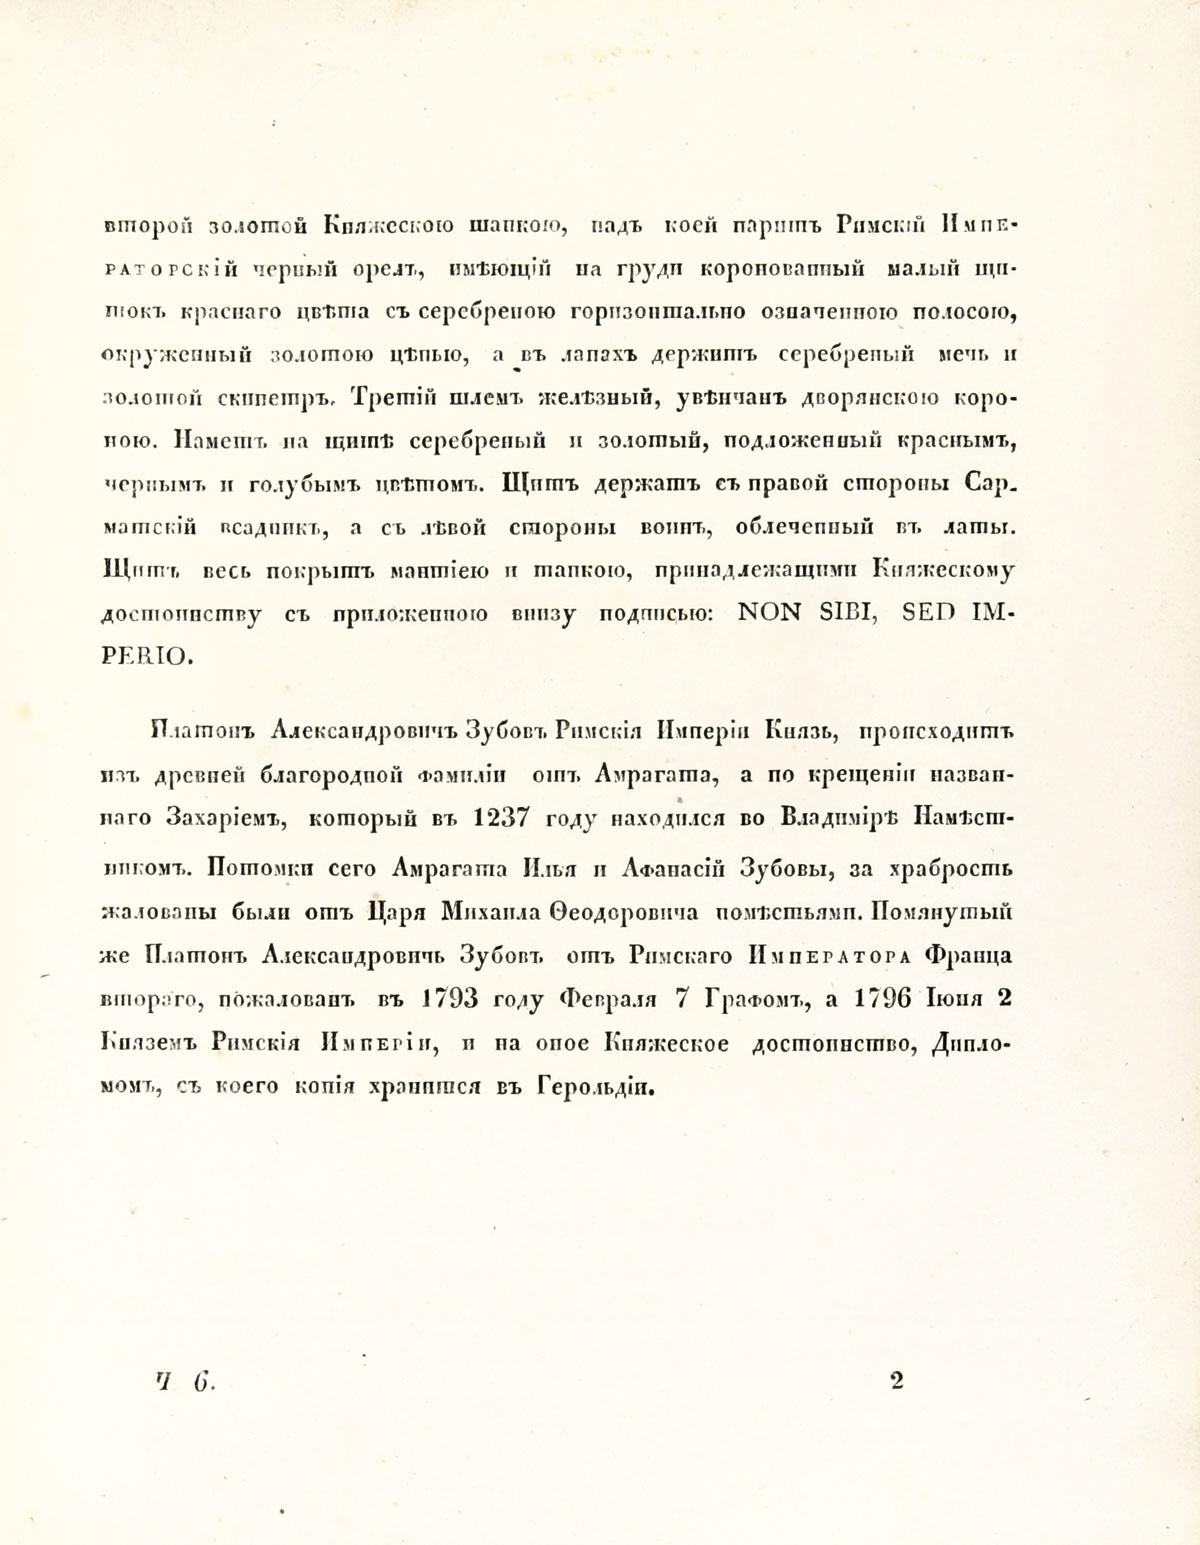 Герб Римской Империи князя Зубова, стр. 3